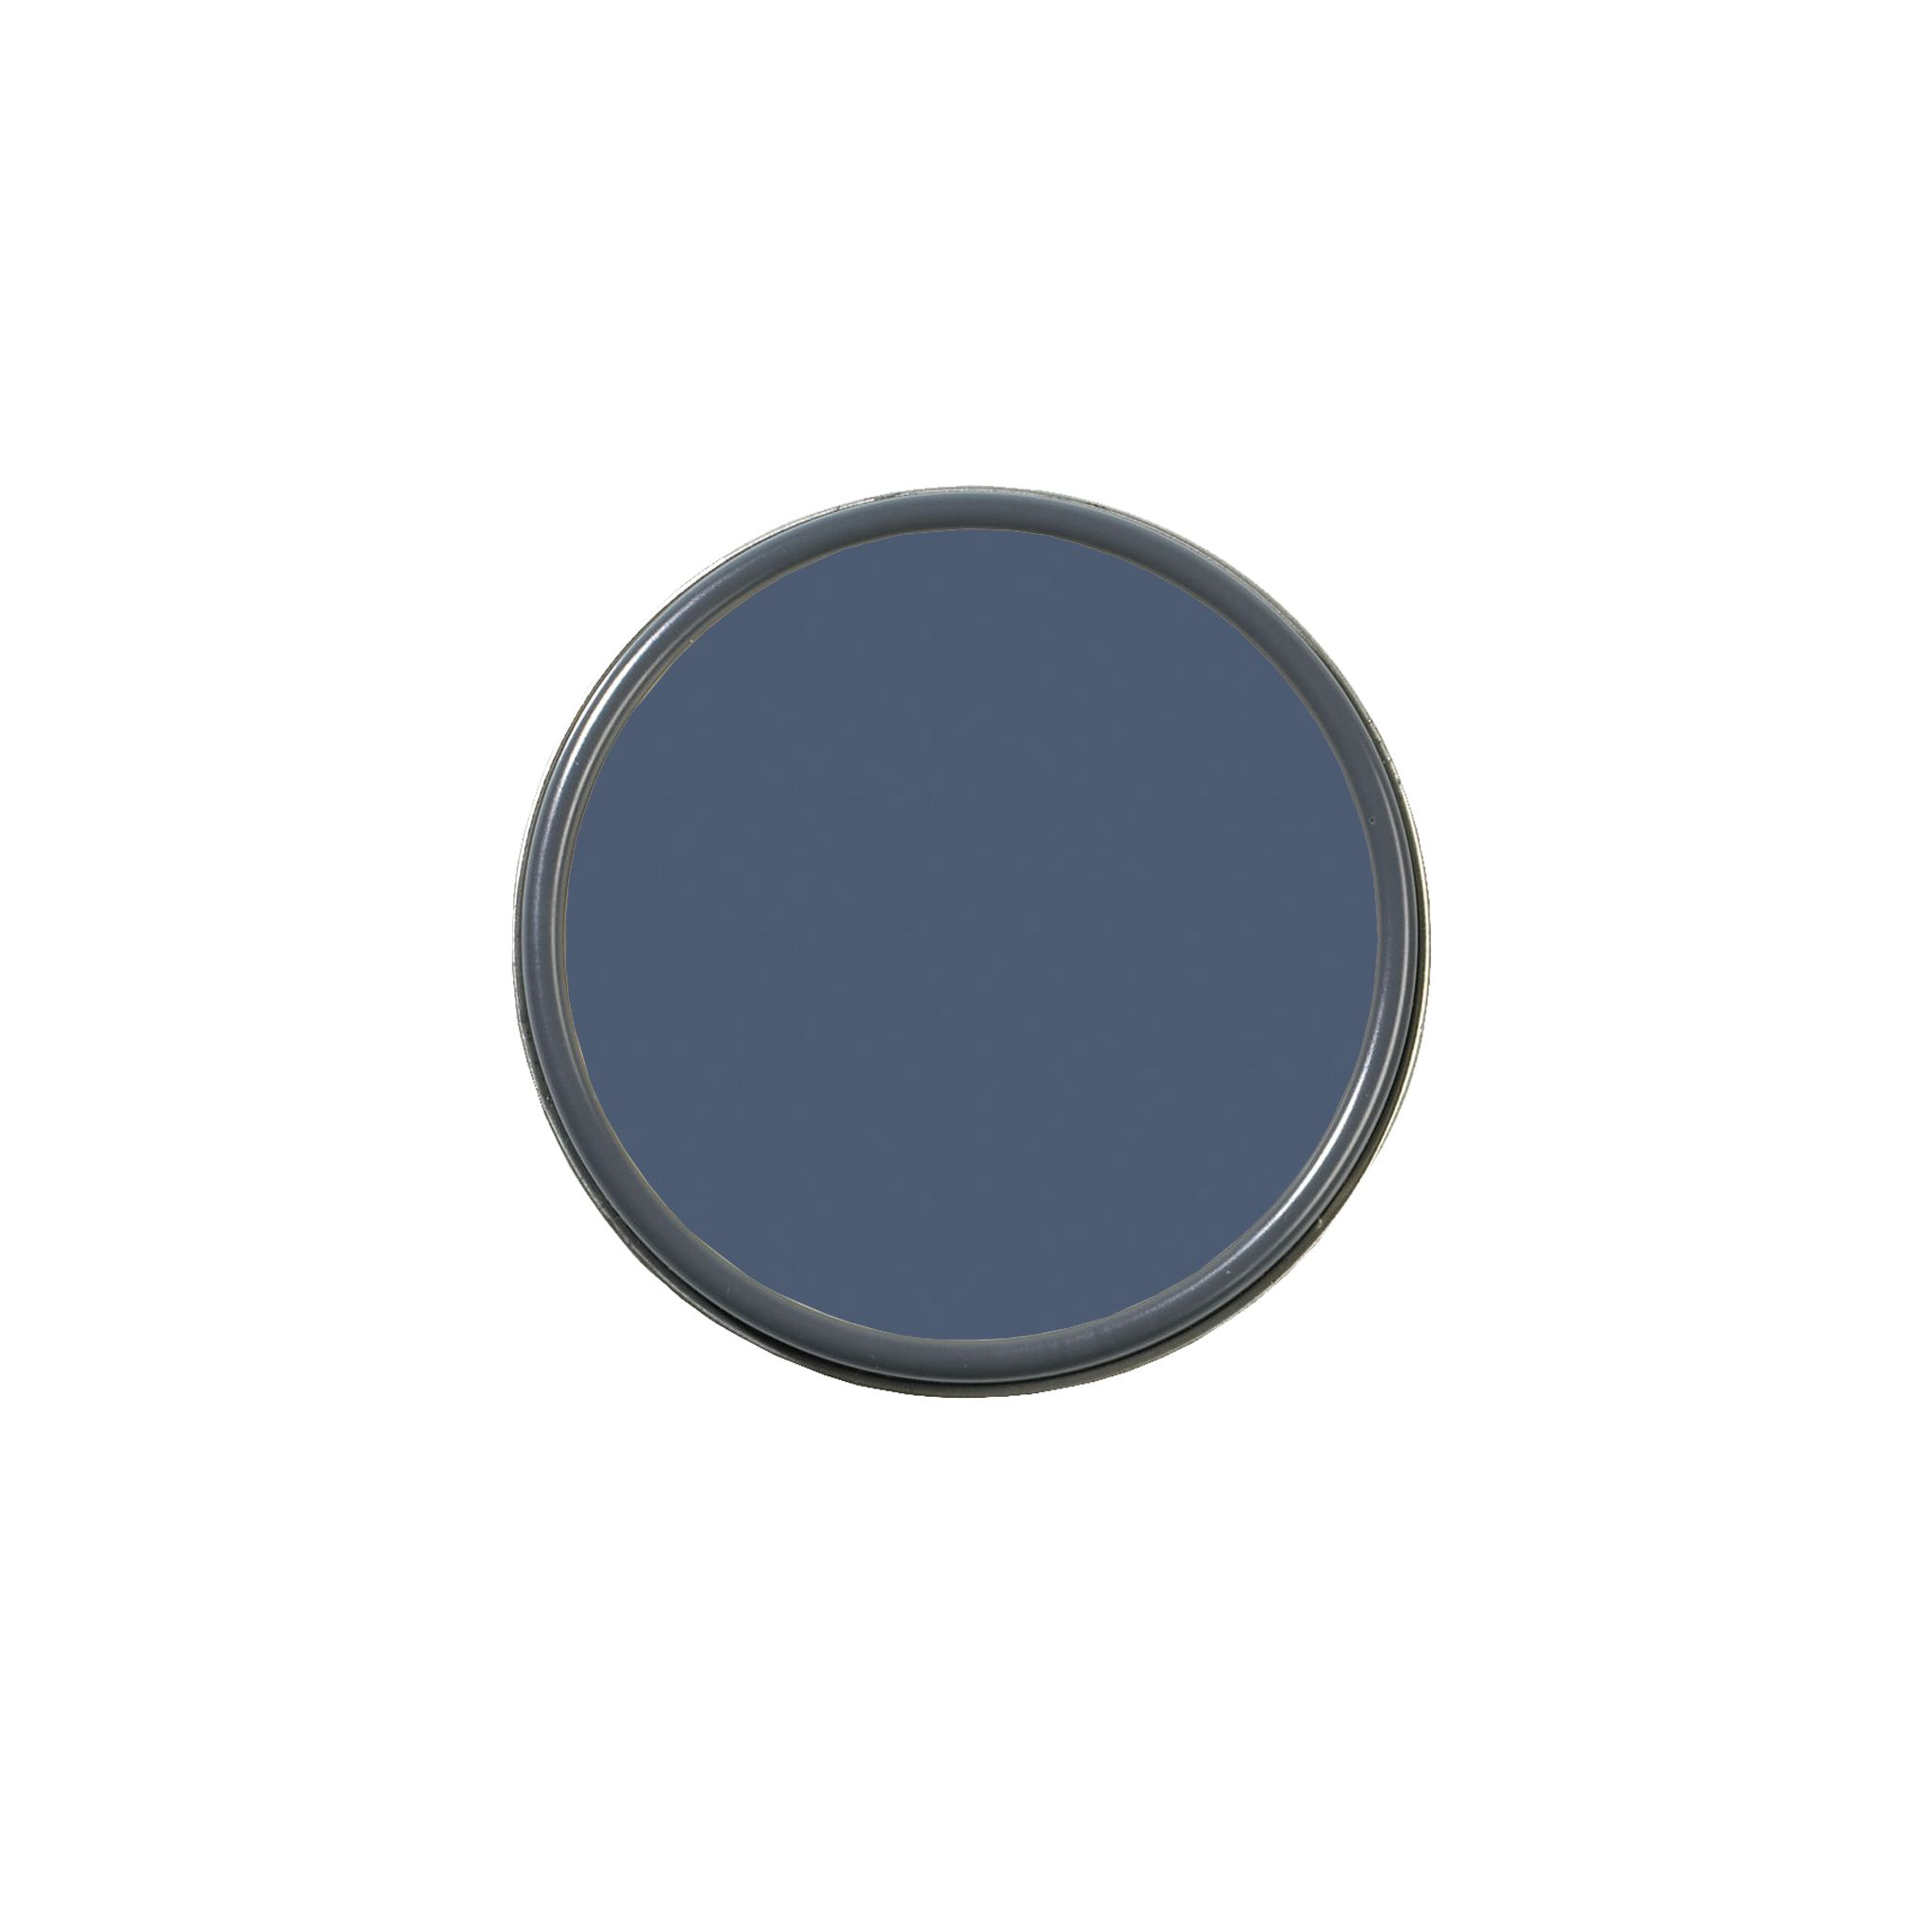 Benjamin Moore - Kensington Blue